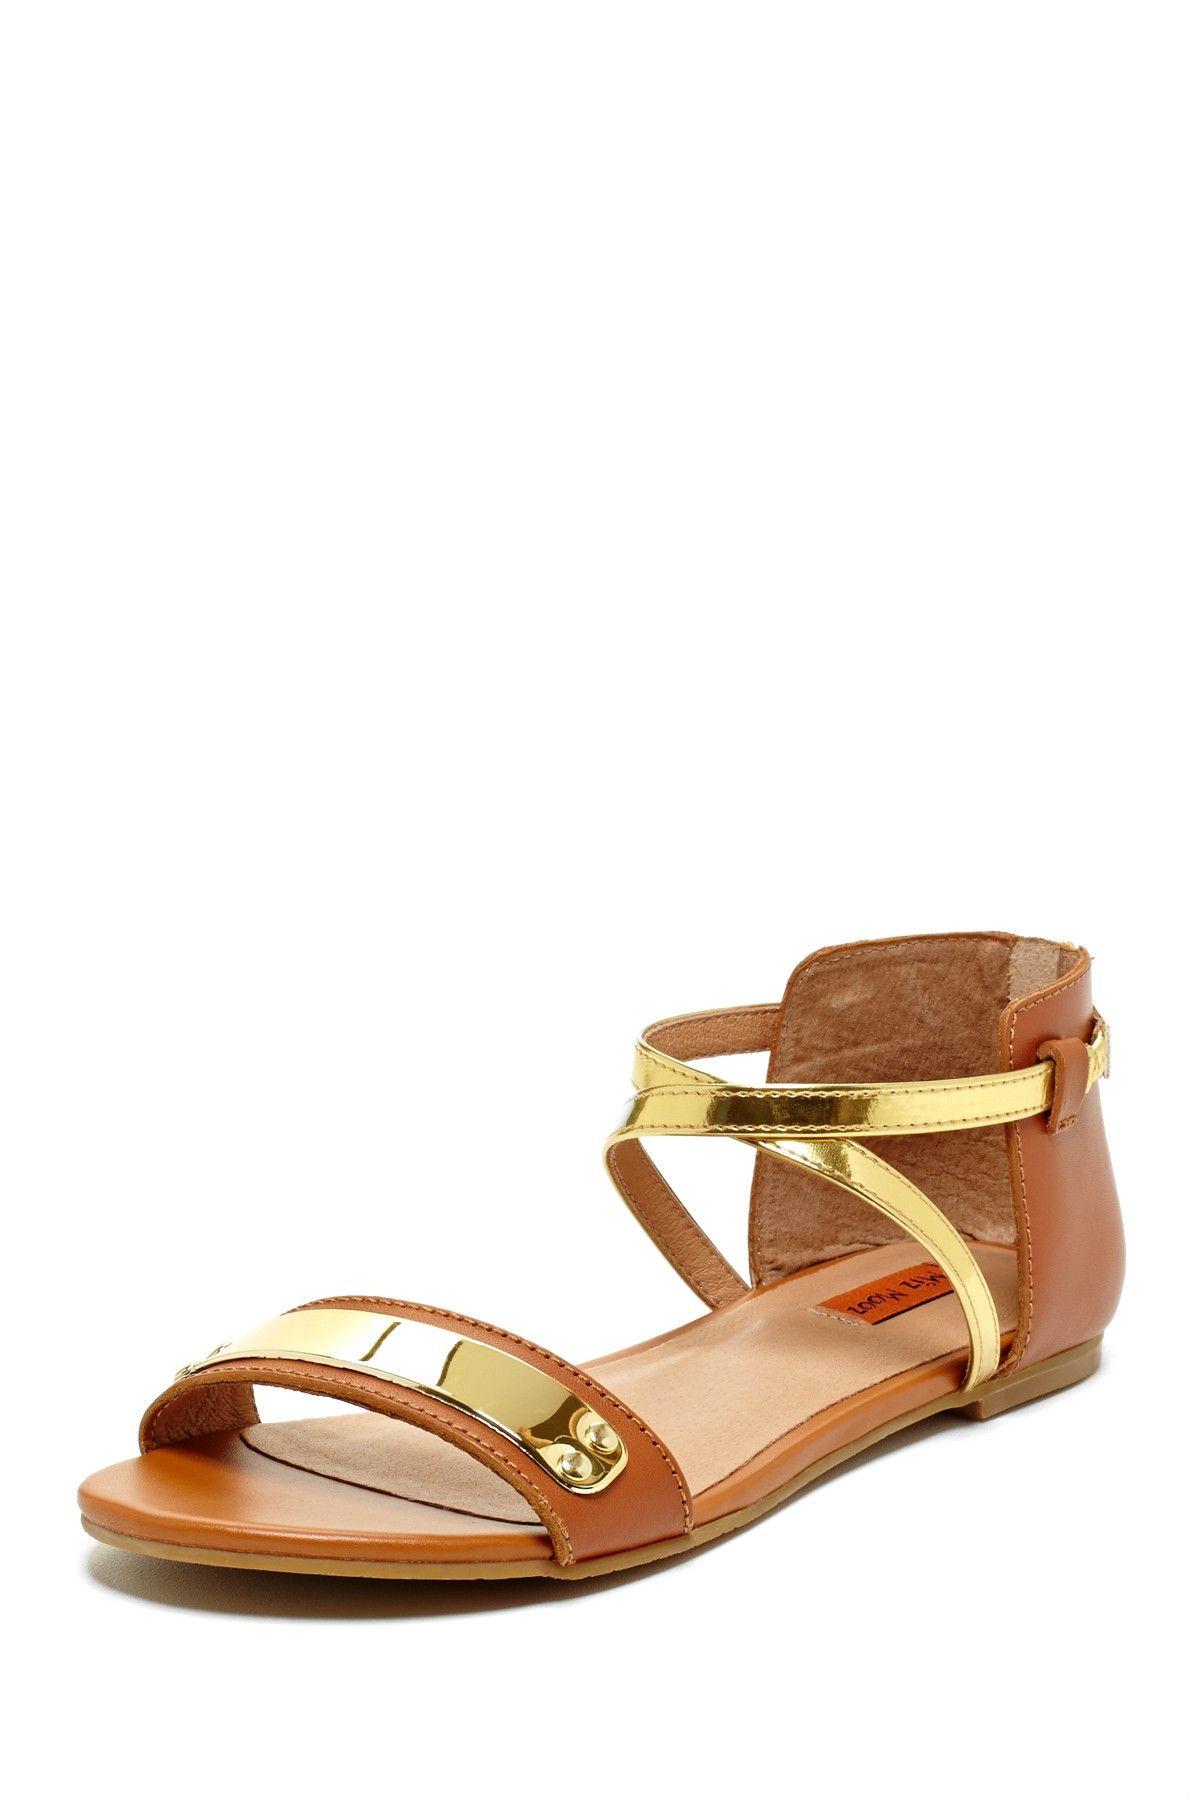 Miz Mooz Mali Sandal